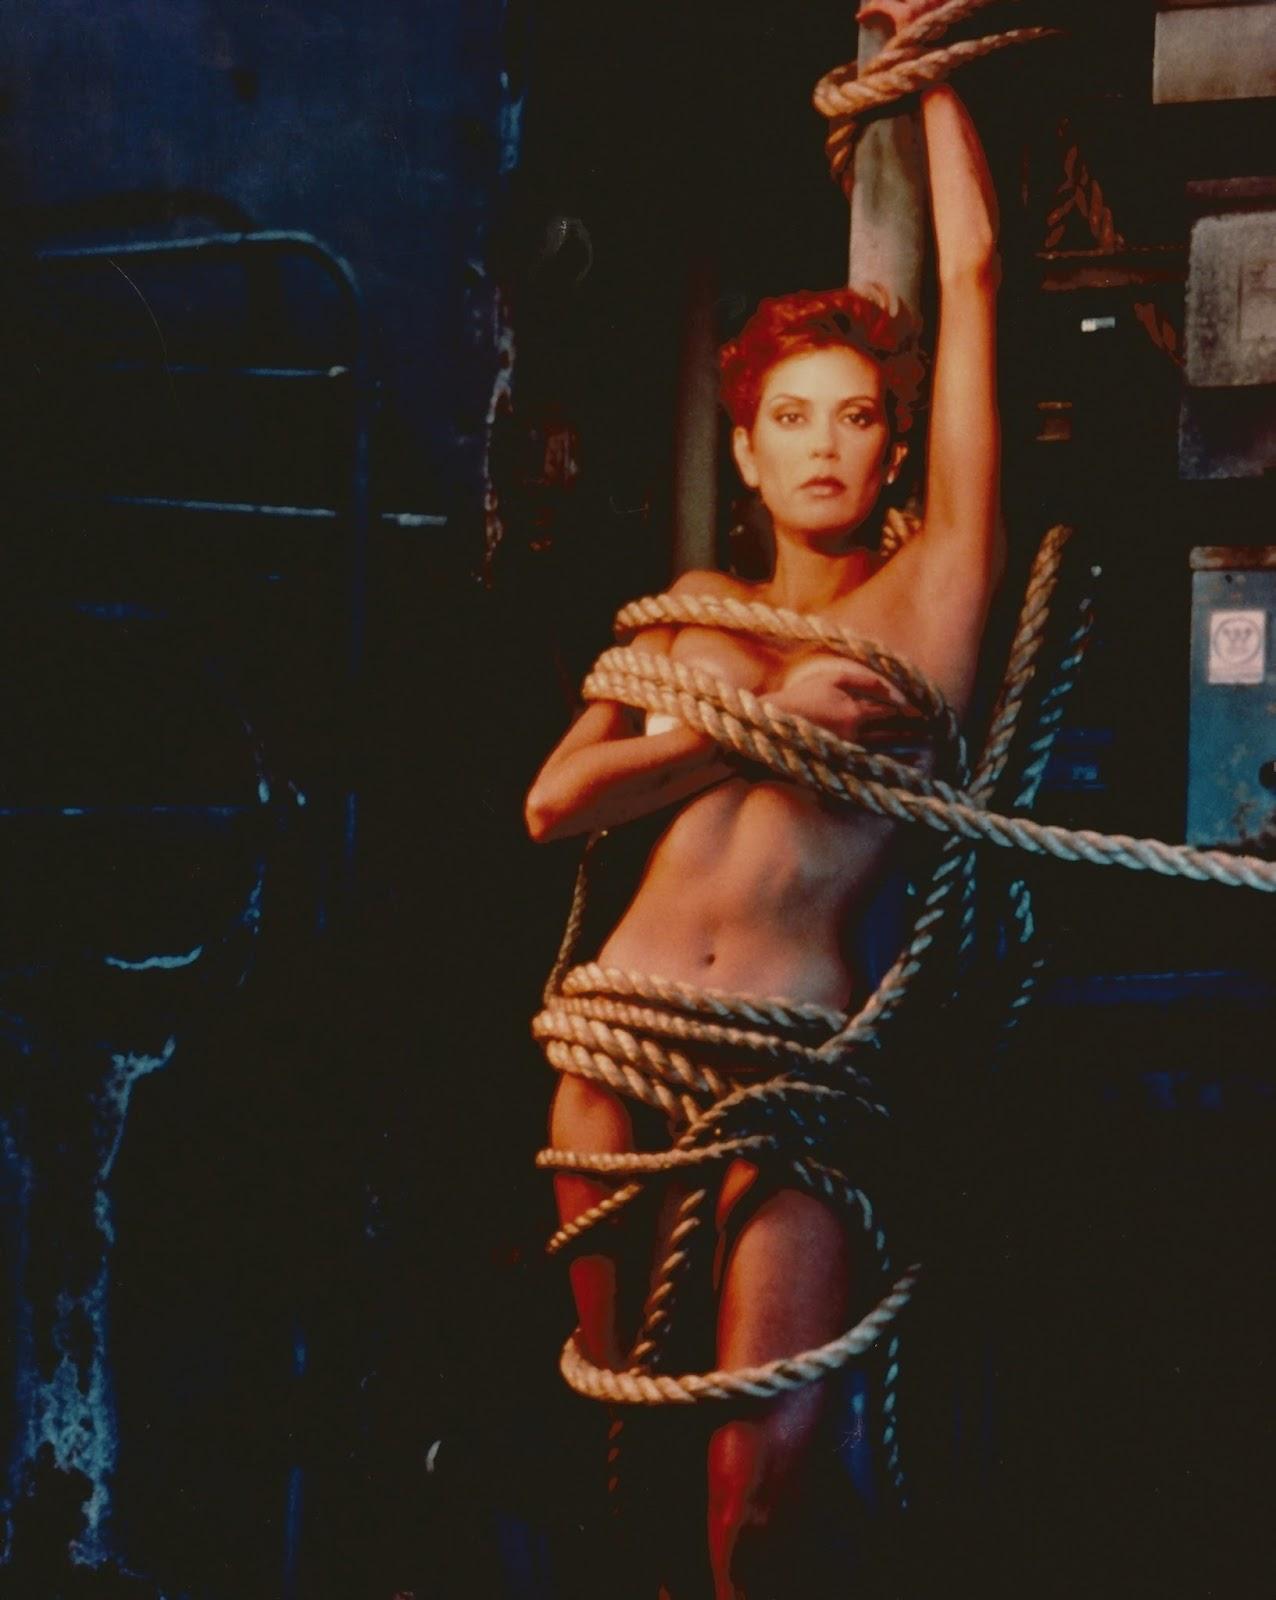 Teri Hatcher Desnuda Sexy Gif Neiked Wumen